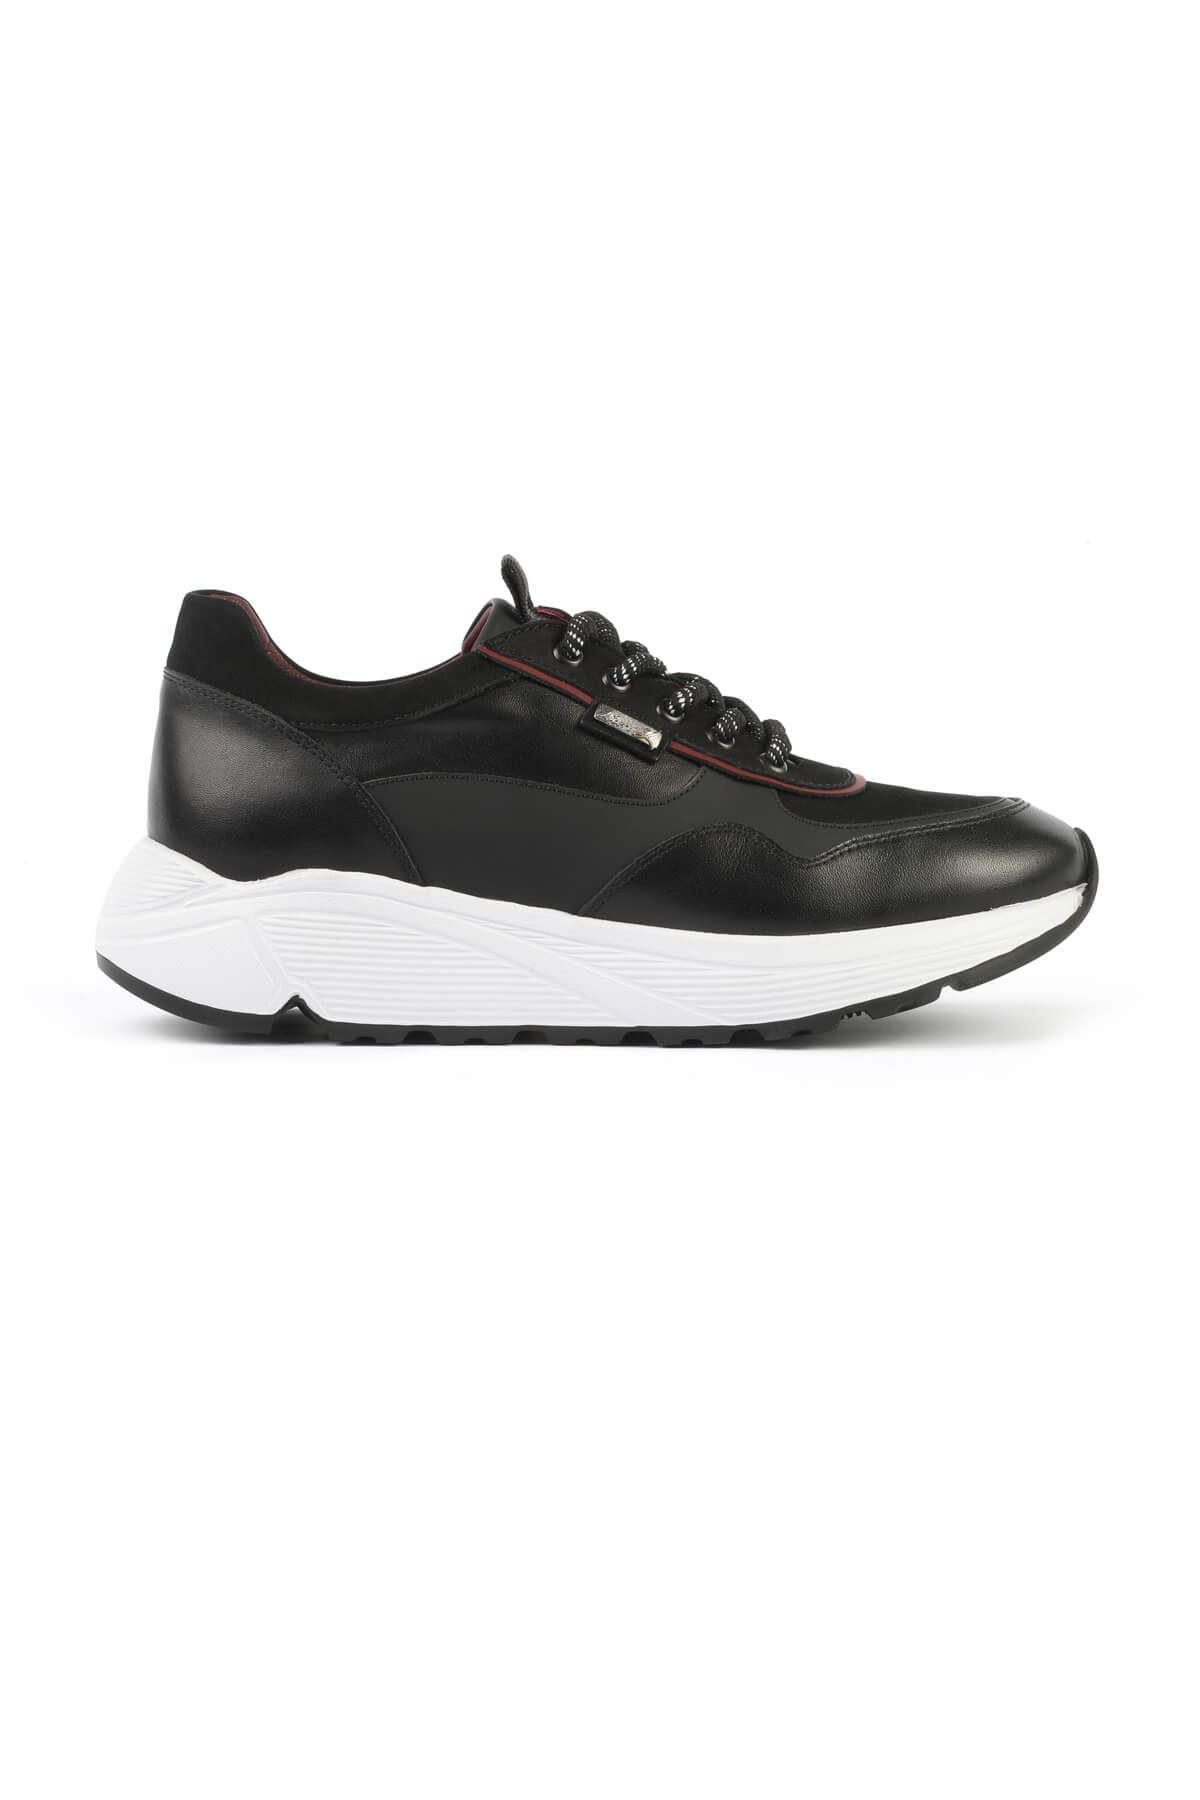 Libero 3158 S.Bordo Spor Ayakkabı